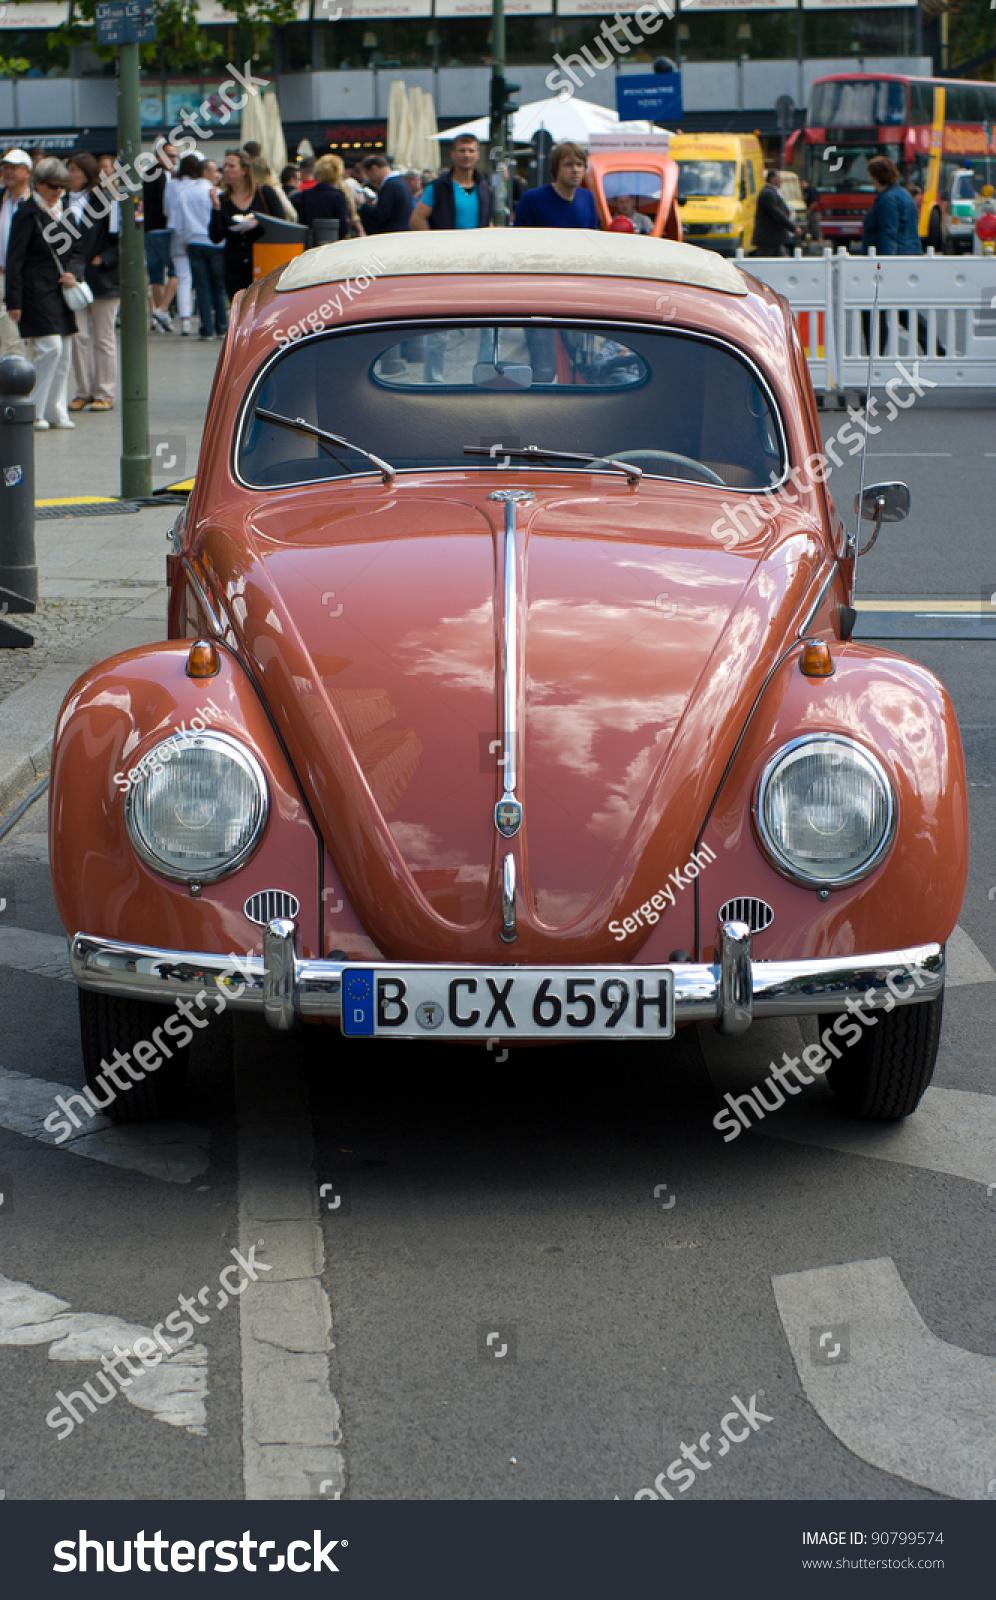 berlin may 28 car volkswagen beetle the exhibition. Black Bedroom Furniture Sets. Home Design Ideas